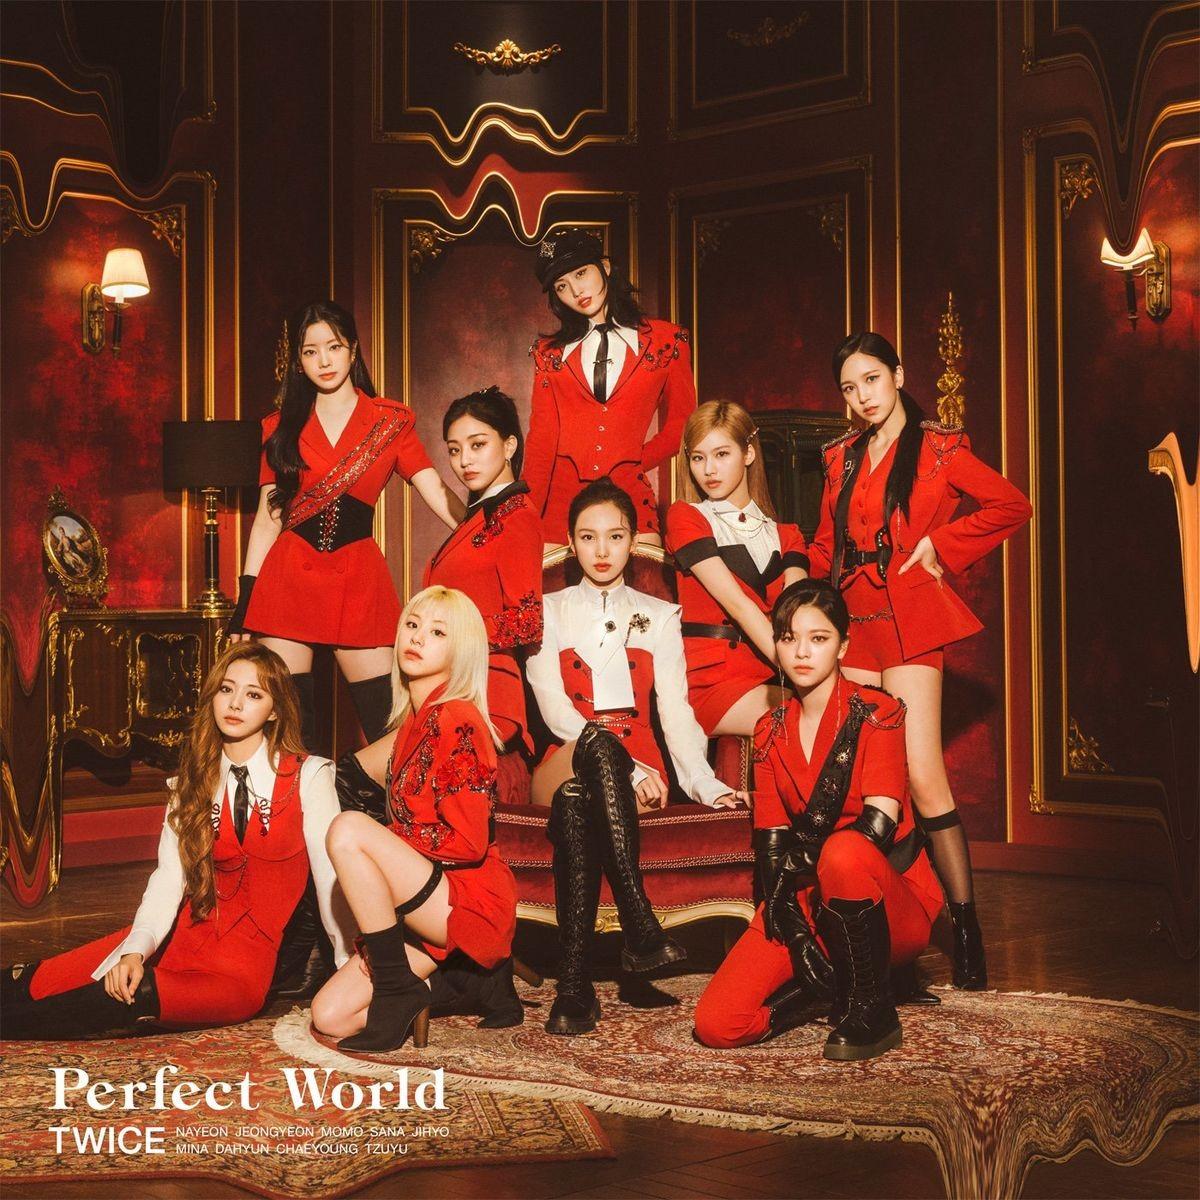 TWICE – Perfect World [FLAC + MP3 320 / WEB] [2021.07.28]